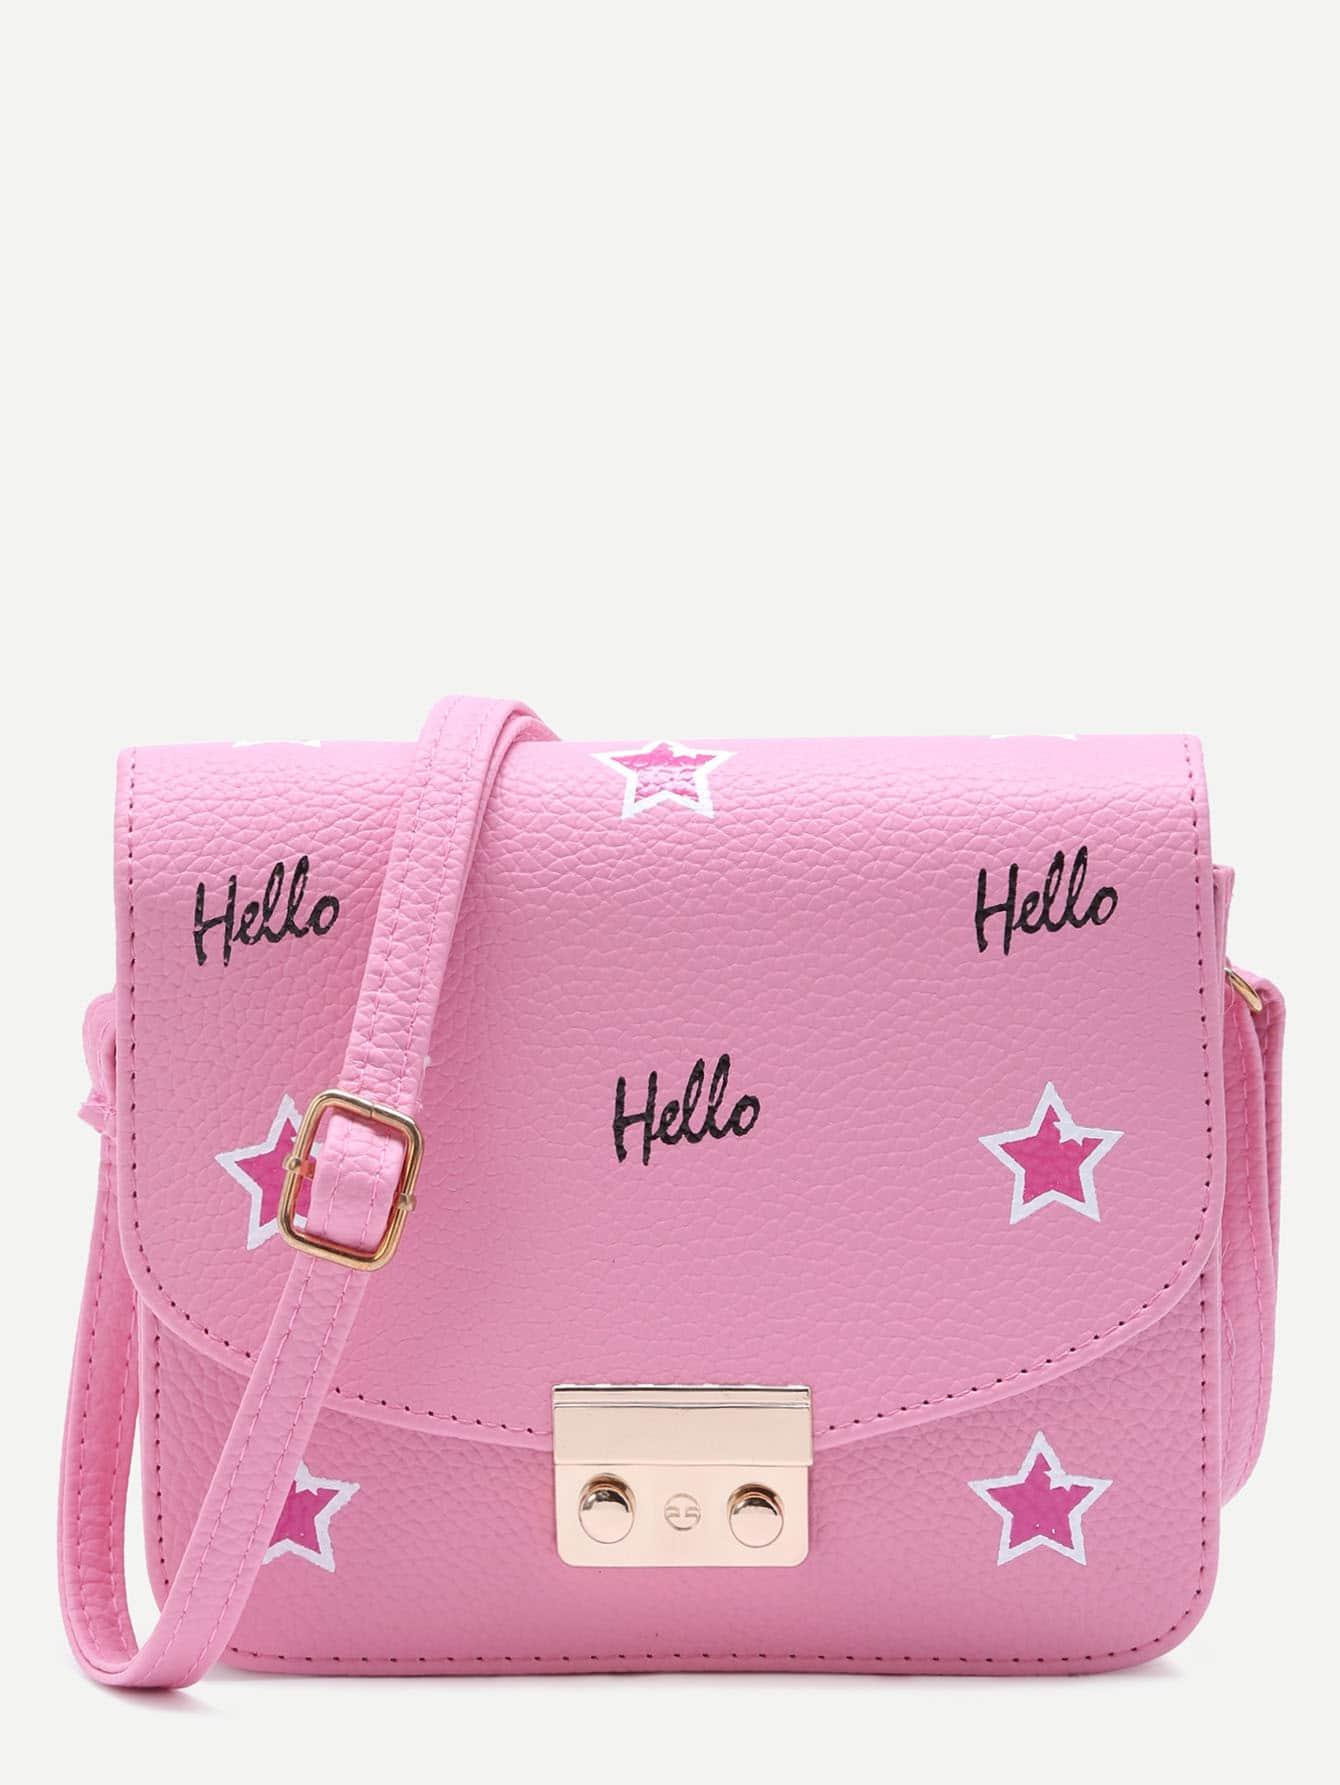 bag161020313_2